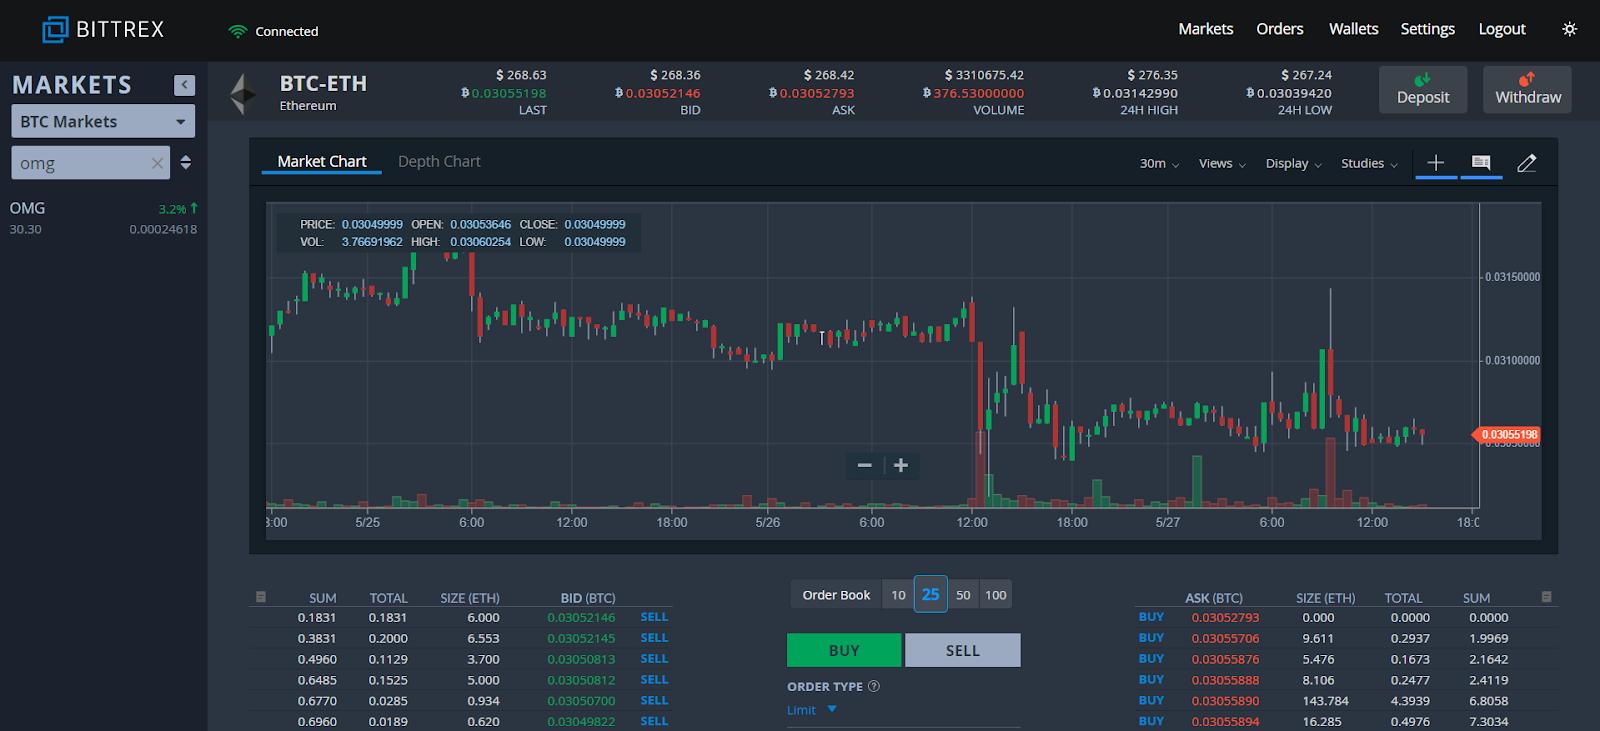 Bittrex BTC - ETH screen shot.